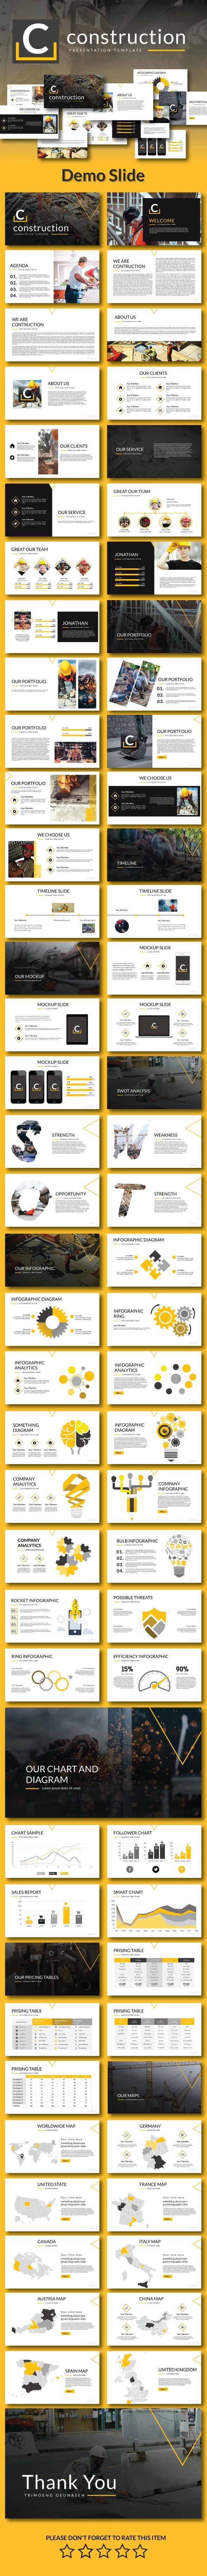 Contruction - Google Slide Template - Google Slides Presentation Templates